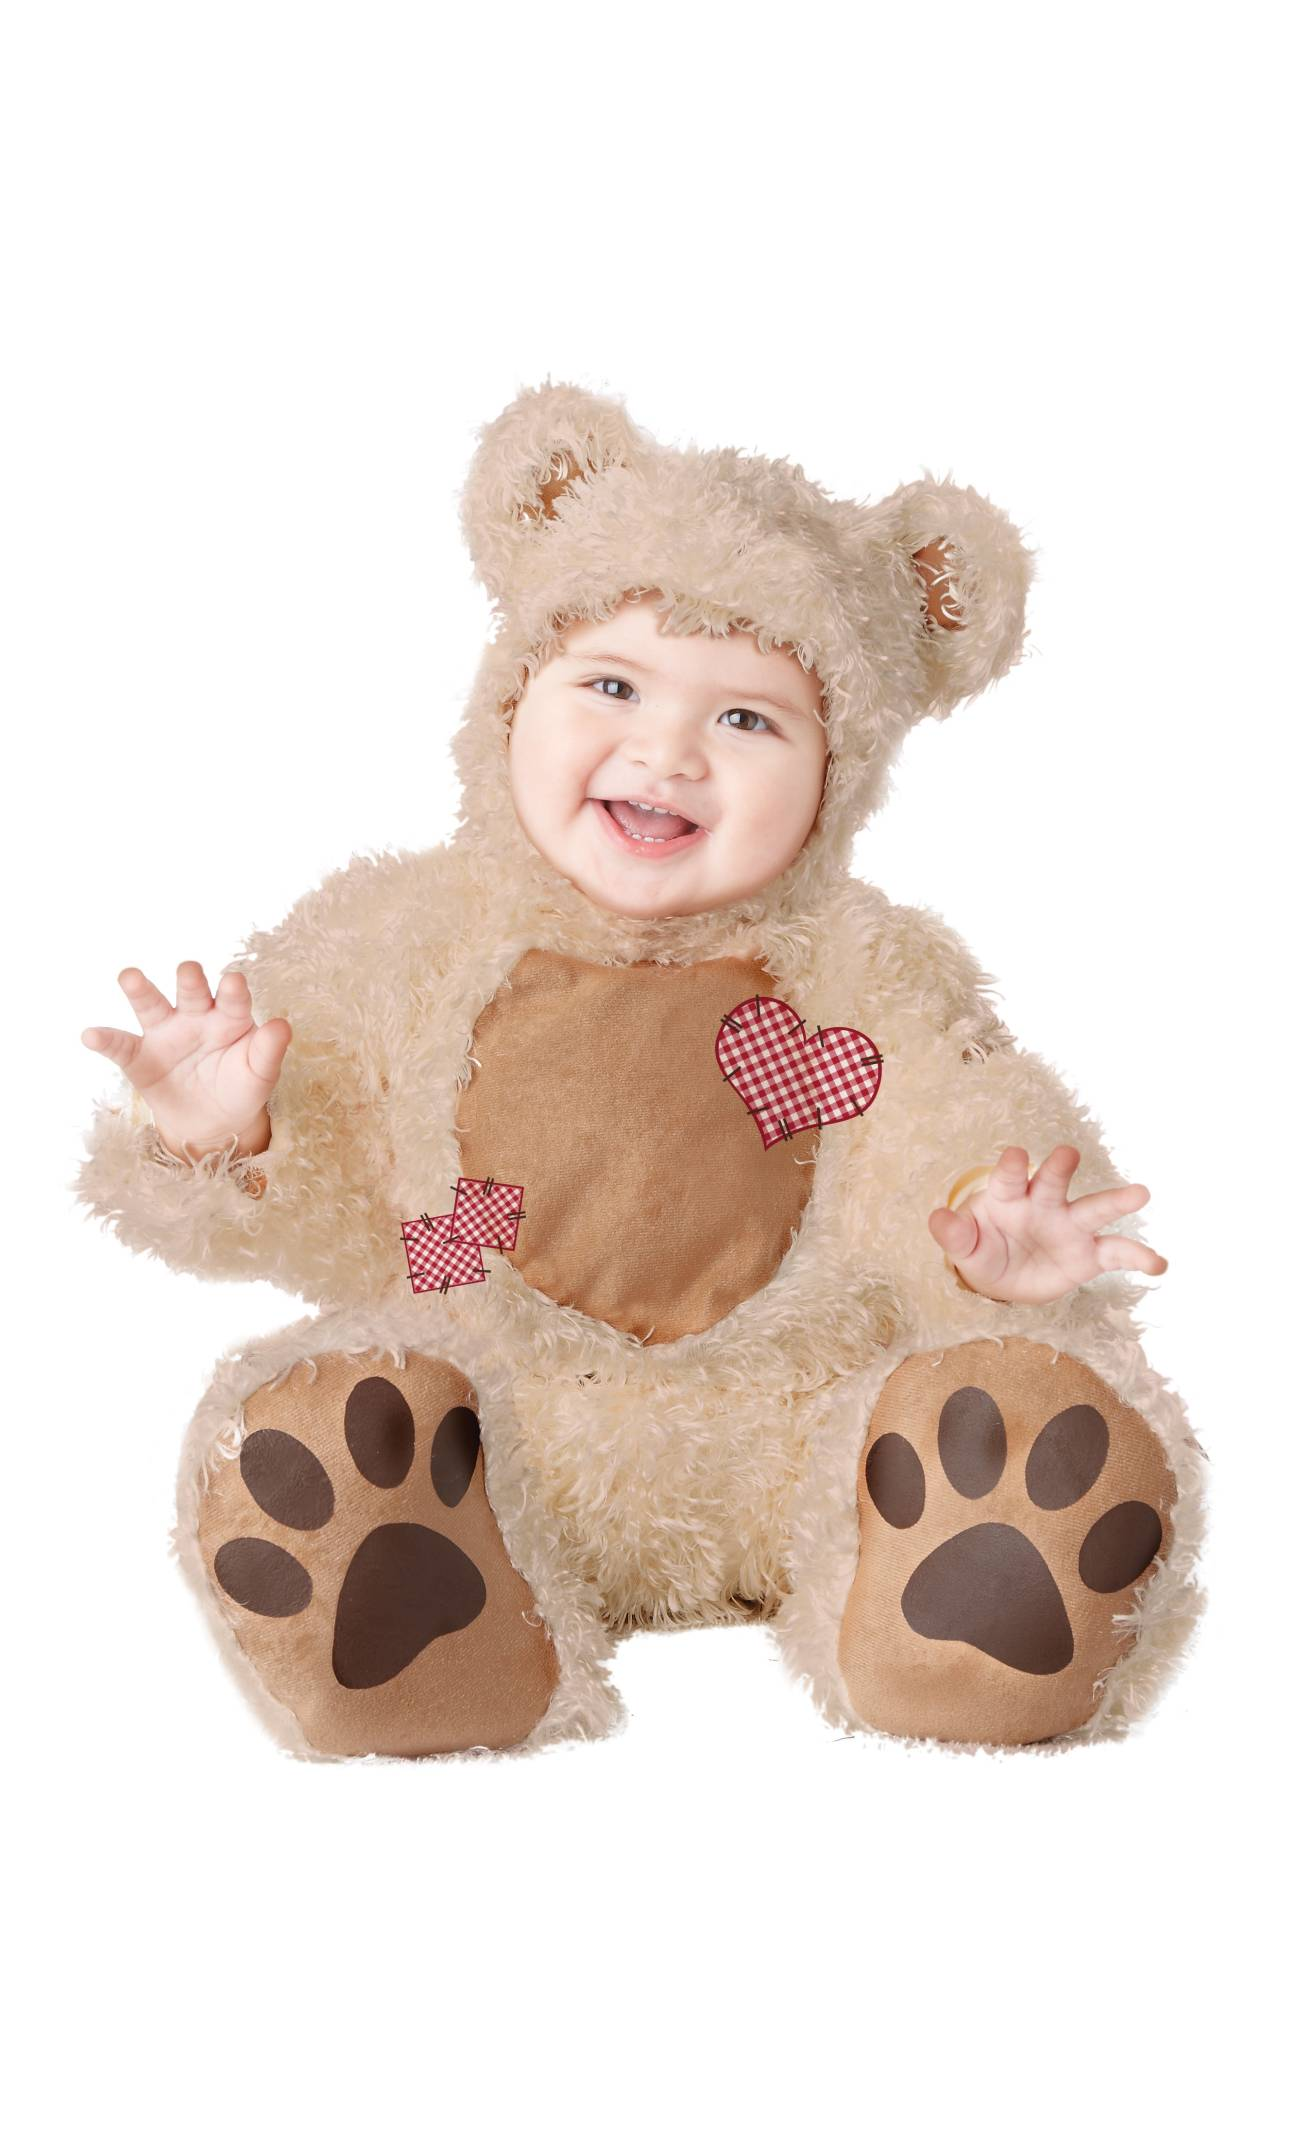 Connu Costume ours bébé-v69420 UP25